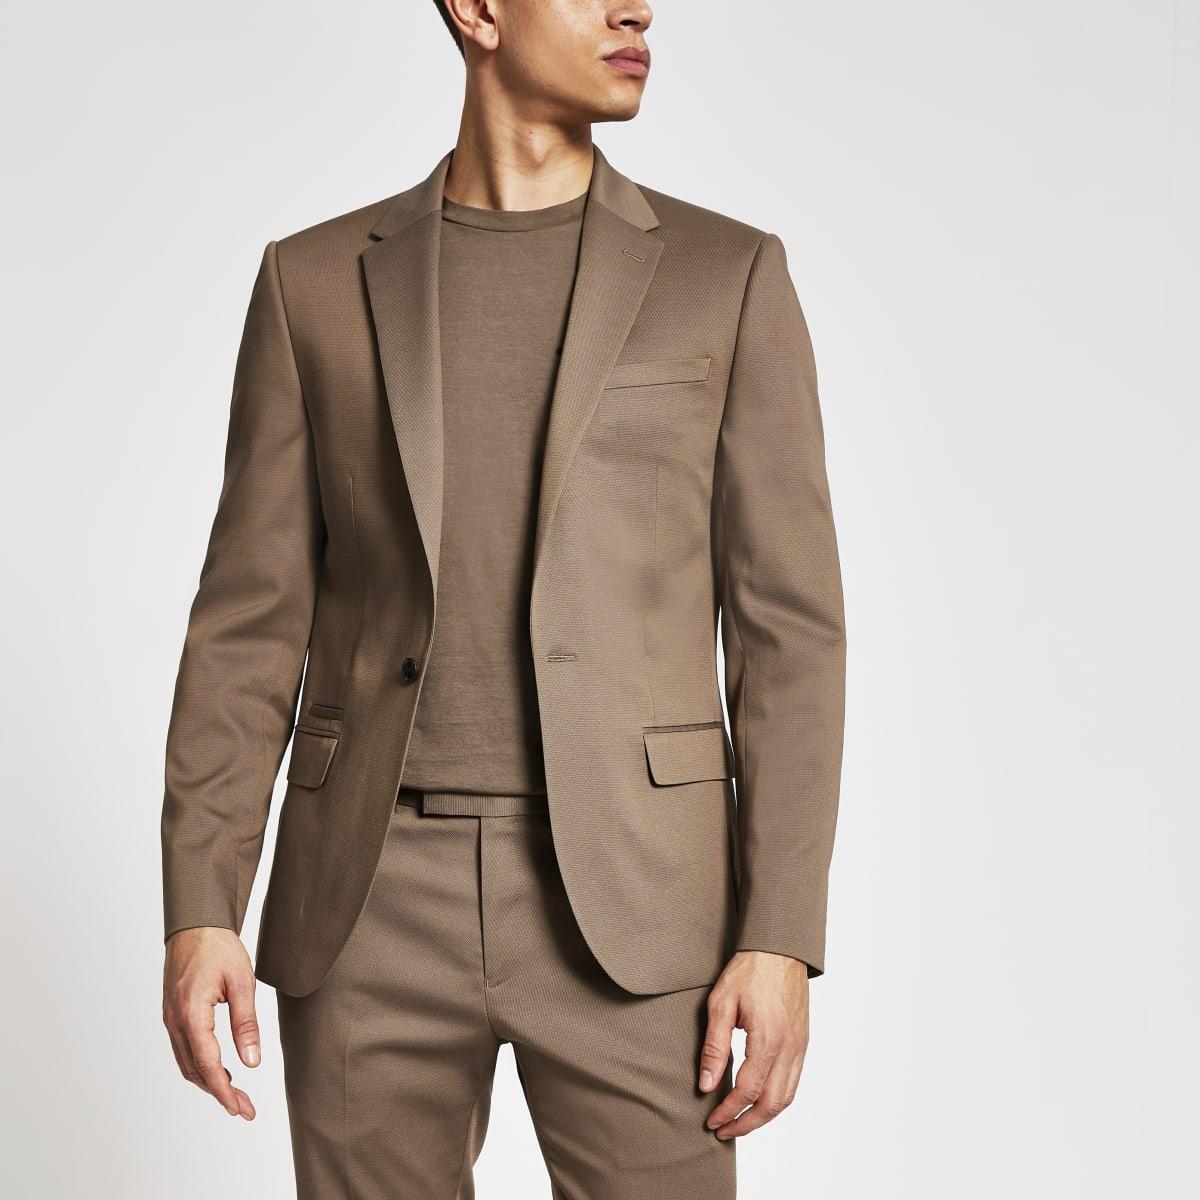 Einreihige Skinny Fit Anzugjacke in Braun